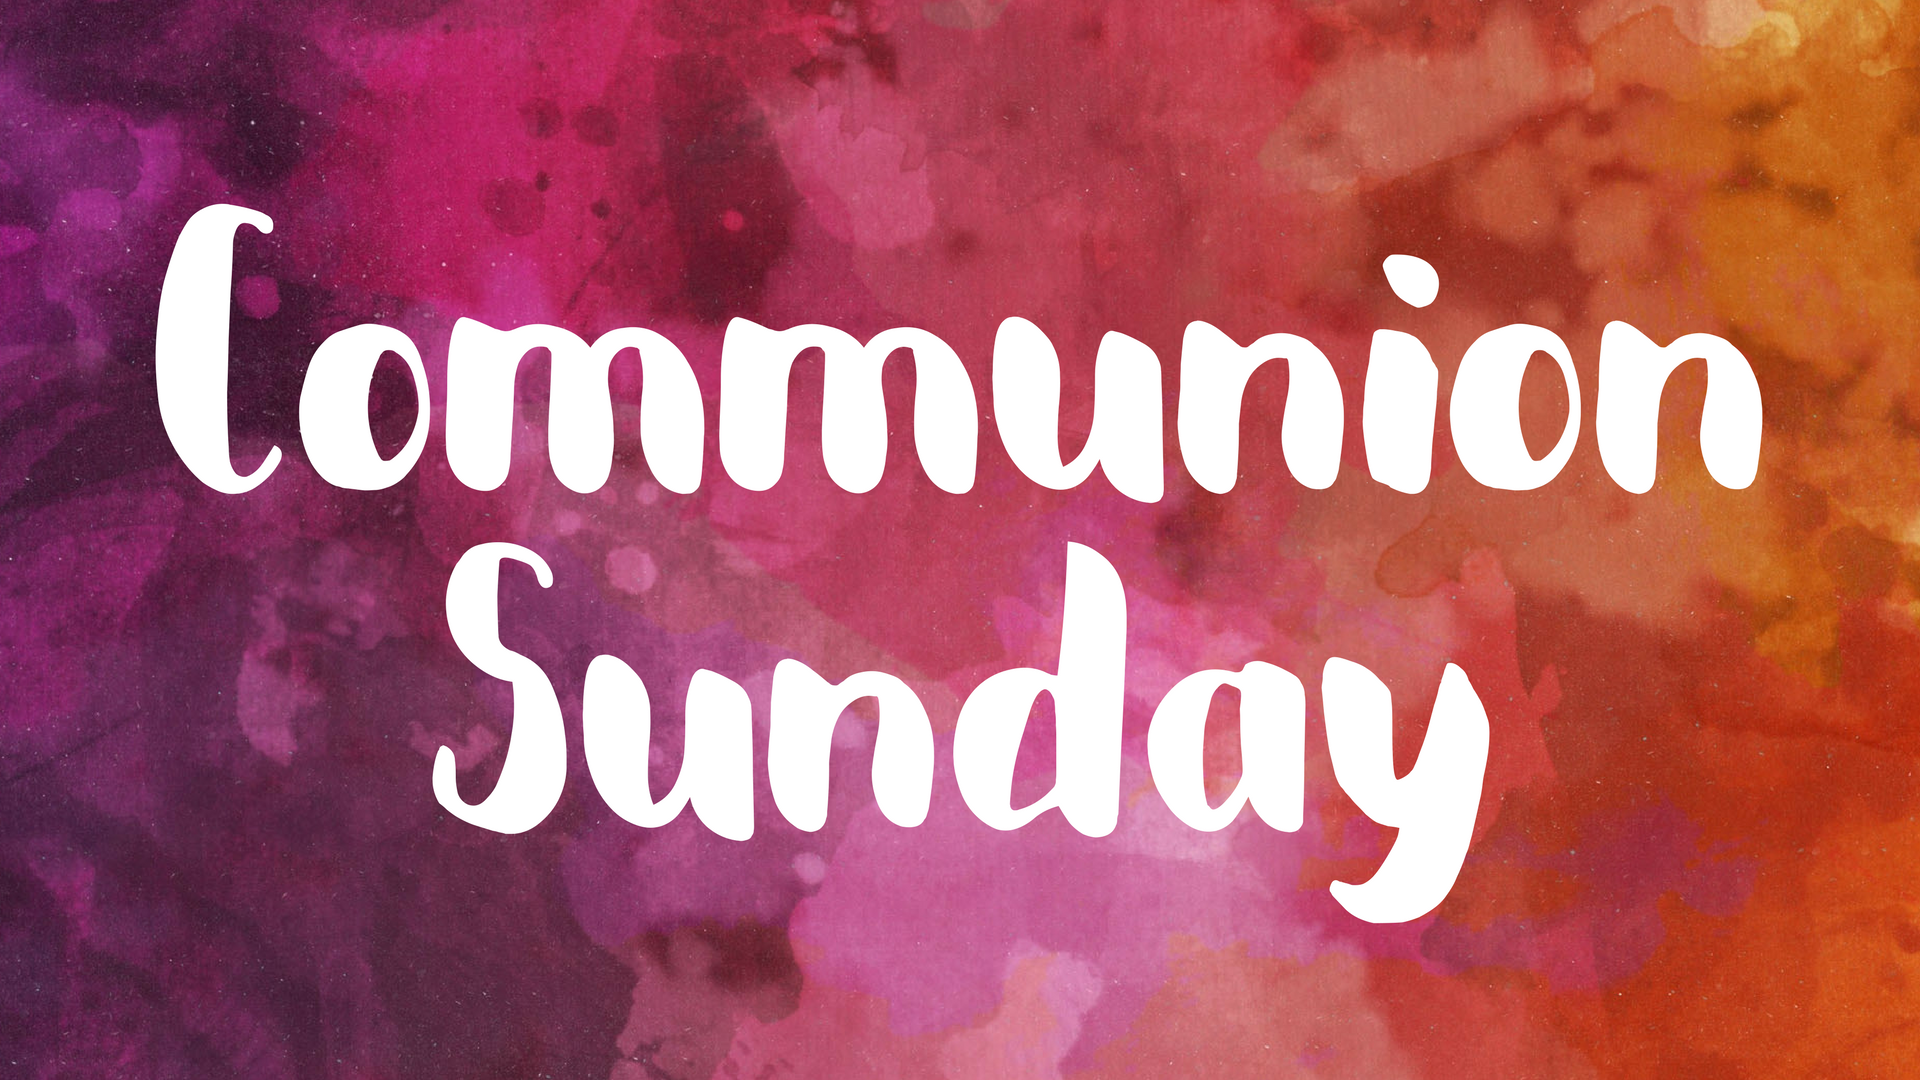 Communion Sunday - Slide.png